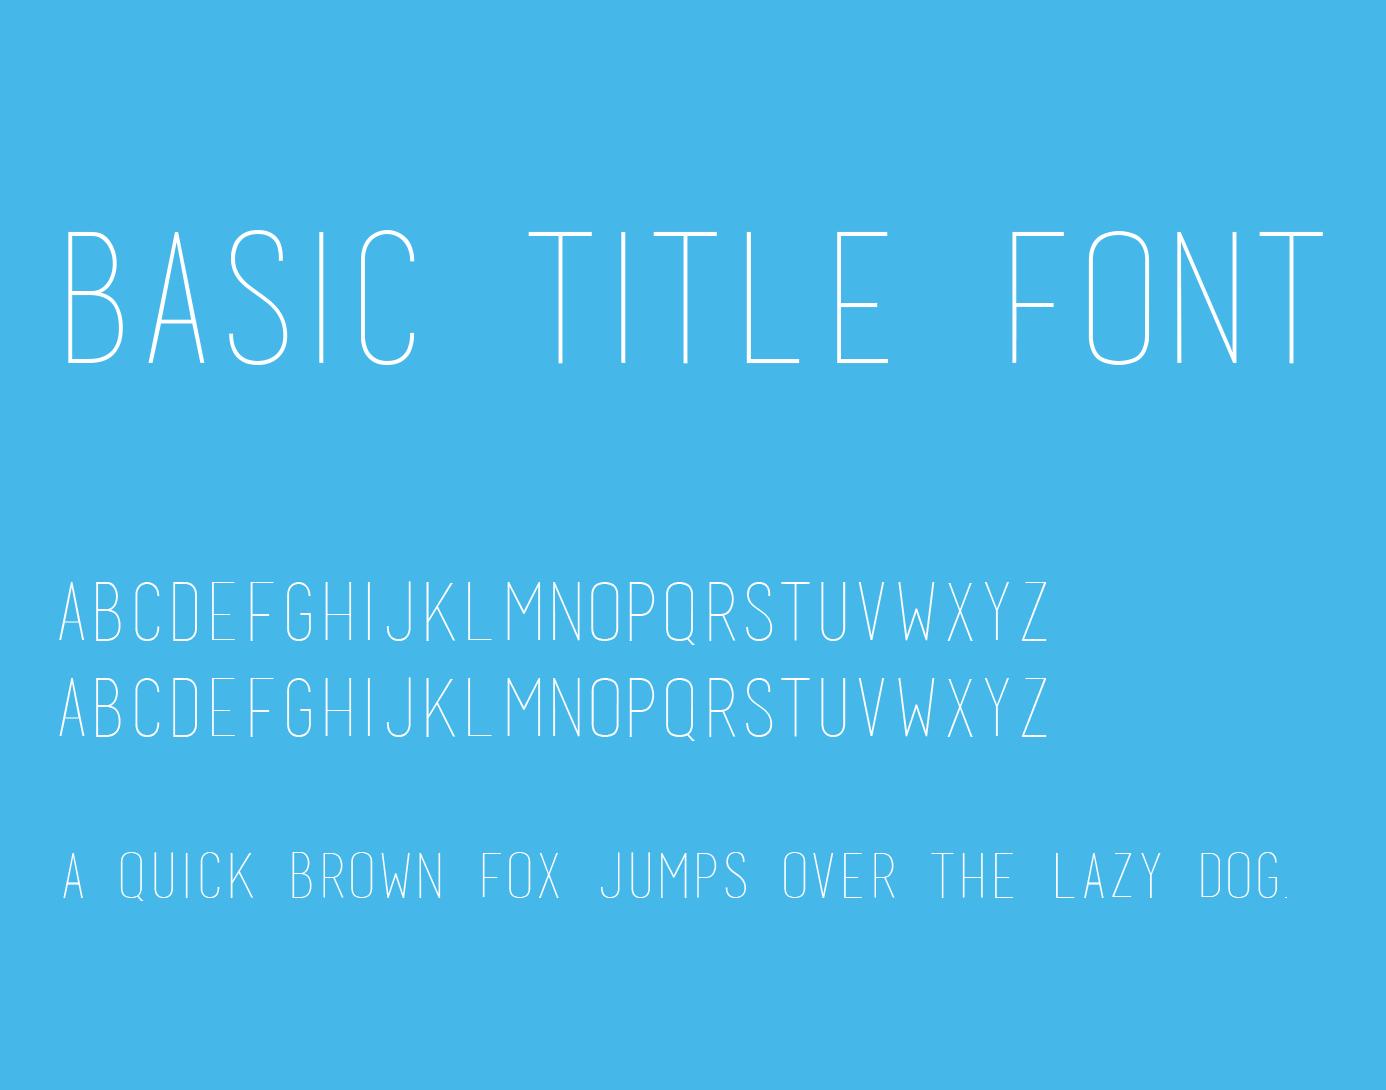 https://fontclarity.com/wp-content/uploads/2019/09/basic-title-font-download-0.png Free Download